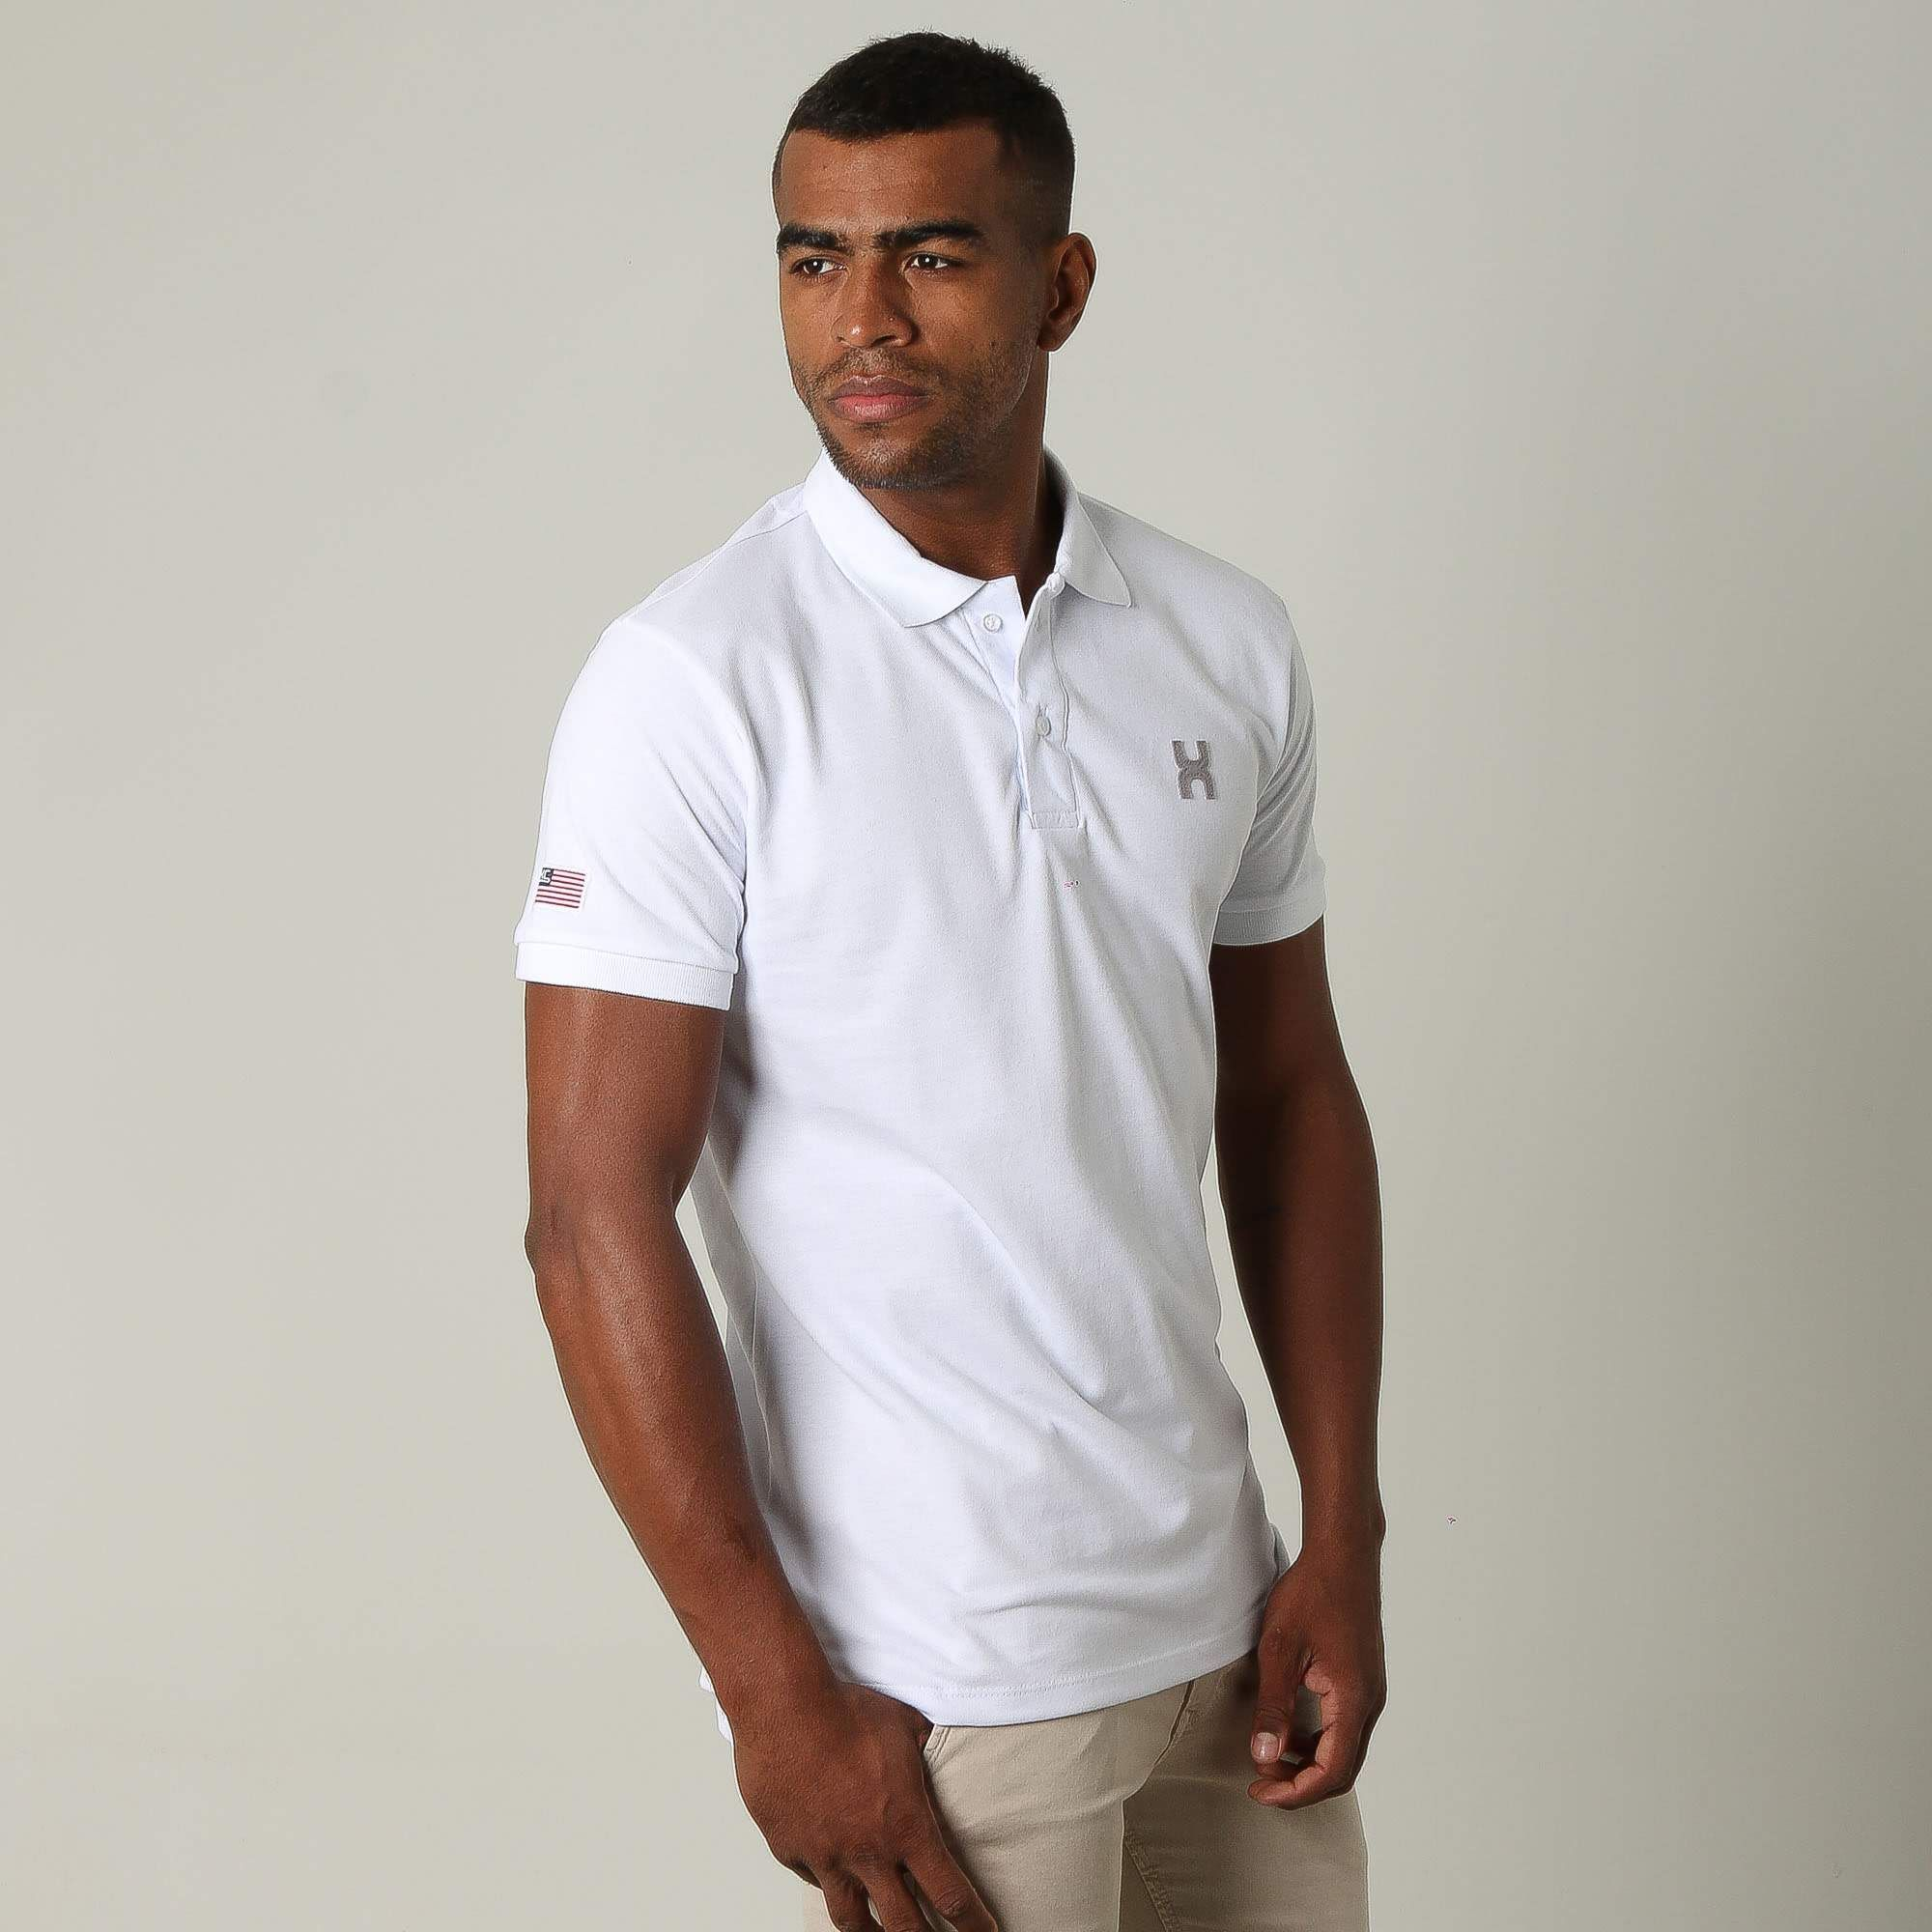 Camiseta Masculina Txc Gola Polo Algodão Lisa - Branca